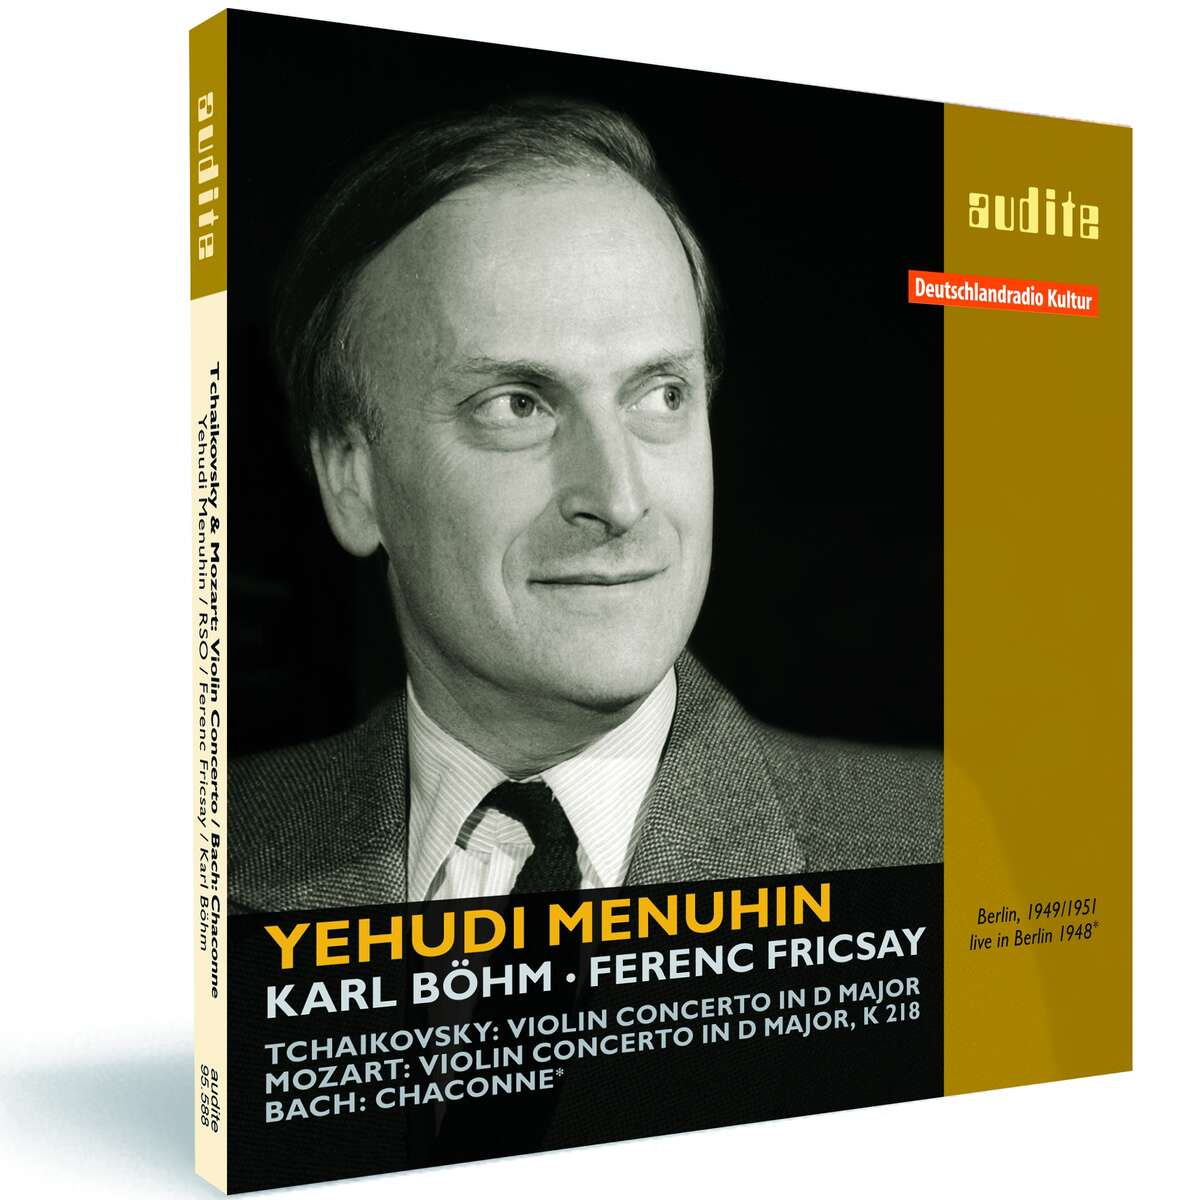 audite! - Yehudi Menuhin plays Tchaikovsky: Violin Concerto, Mozart ...